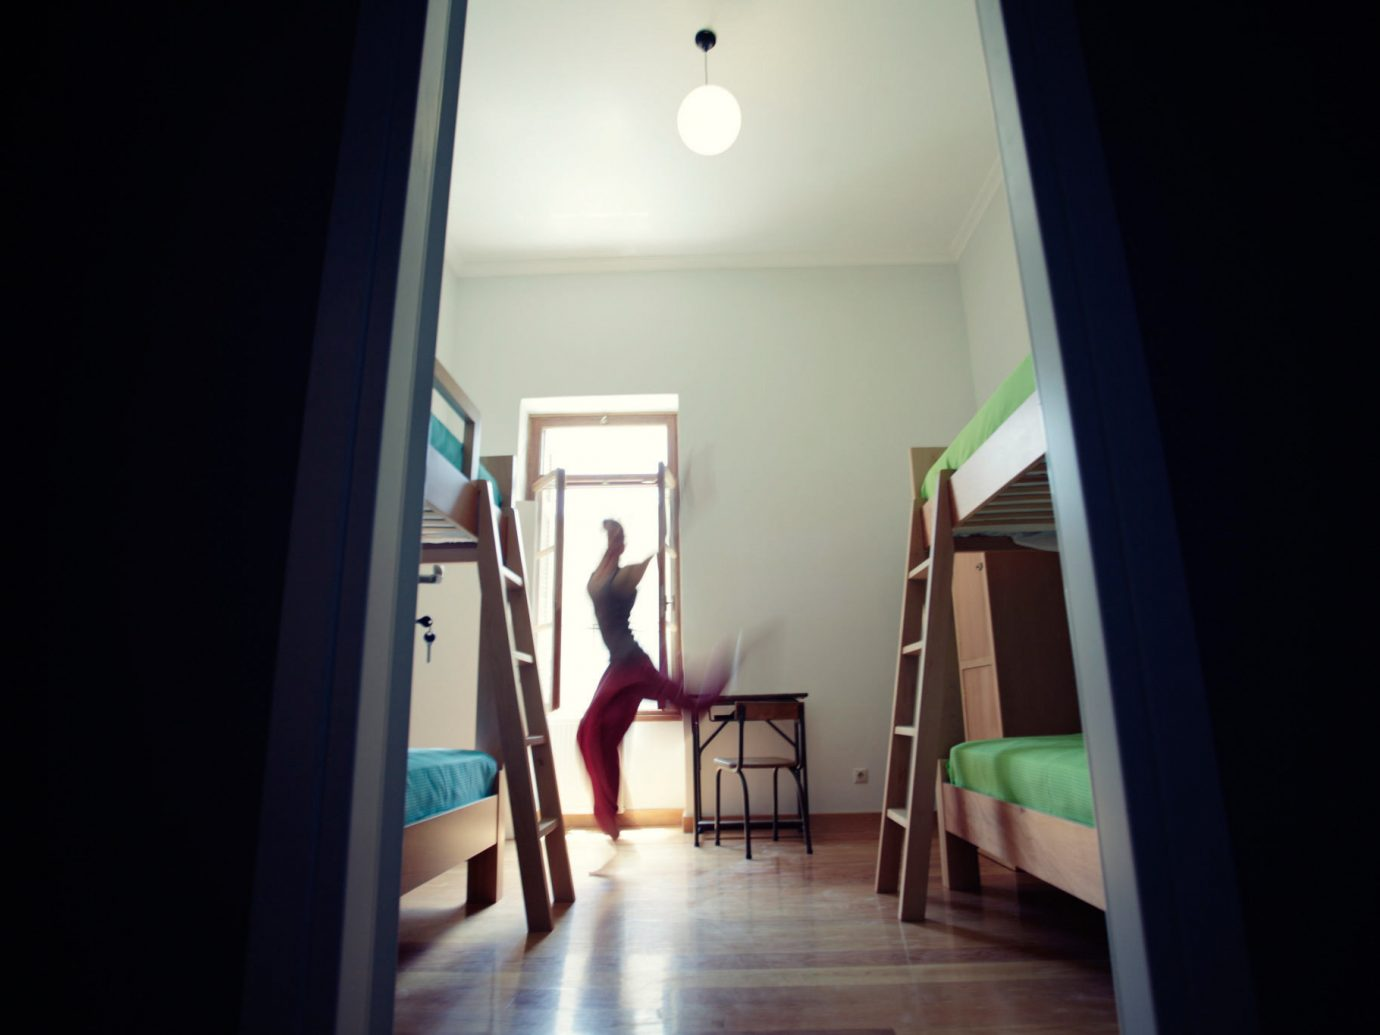 Hotels color floor indoor property house room light home interior design lighting Design apartment